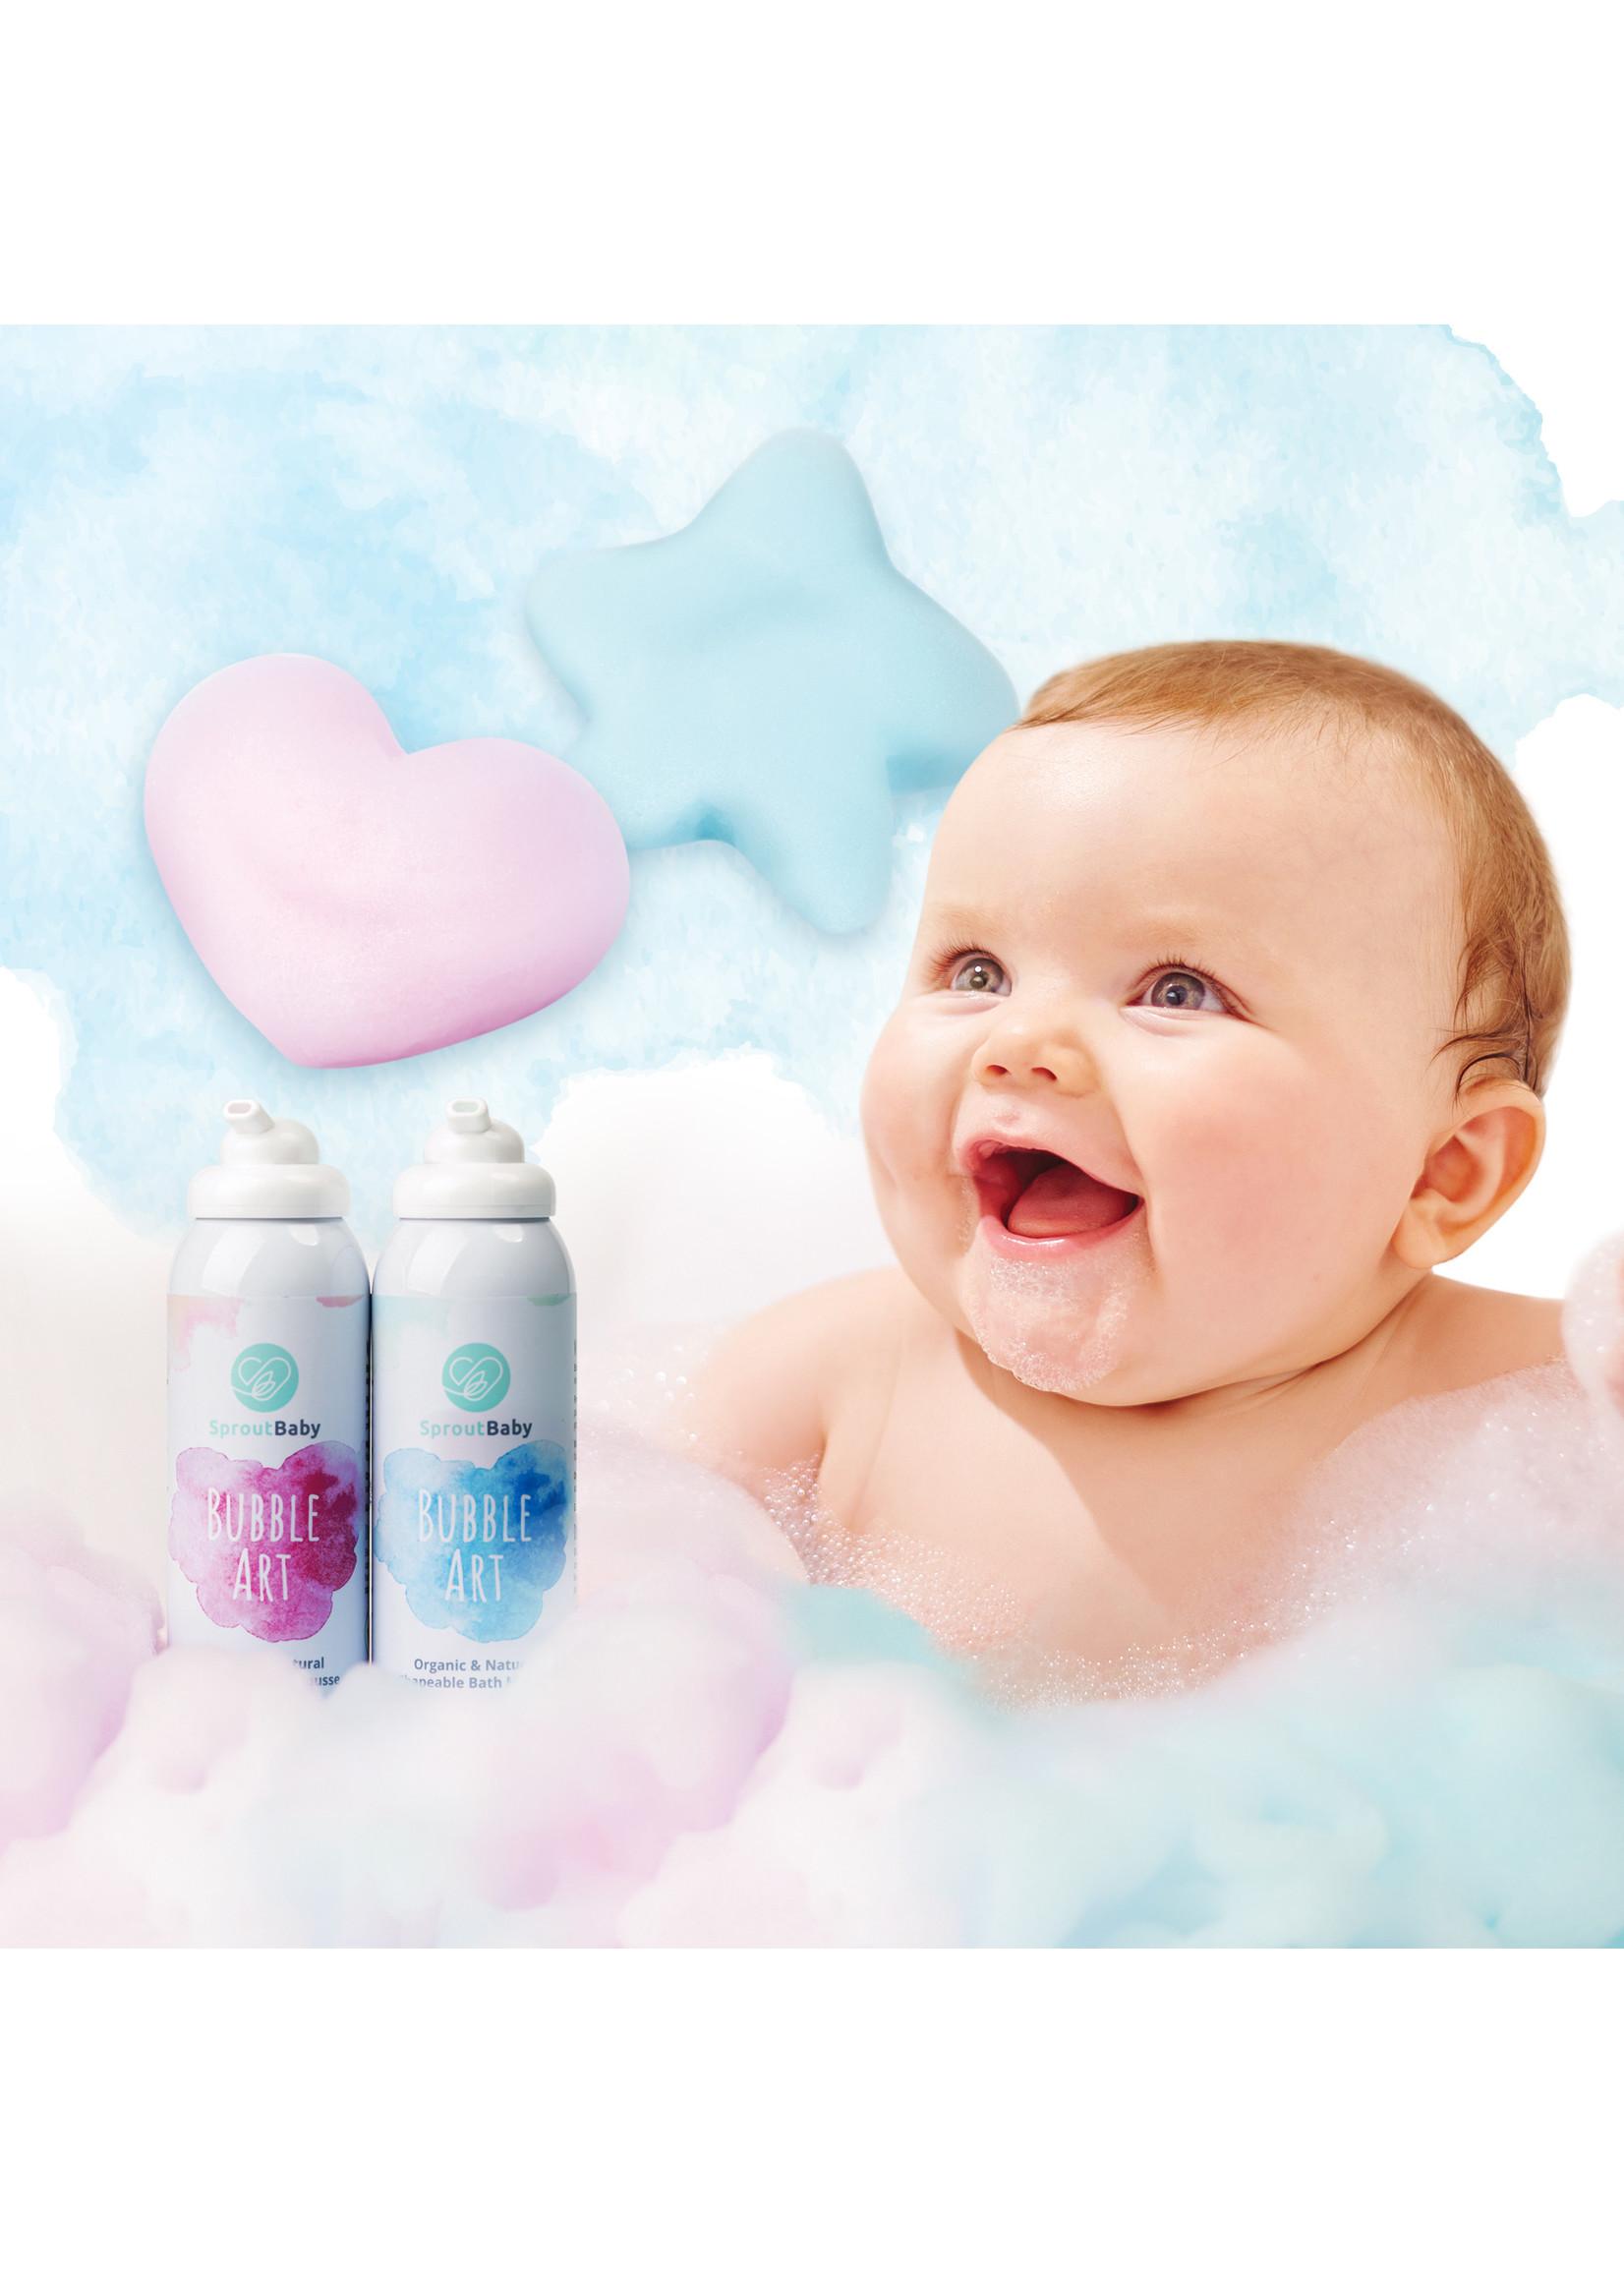 Sprout Baby Bubble Art – All Natural Shapeable Bath Mousse